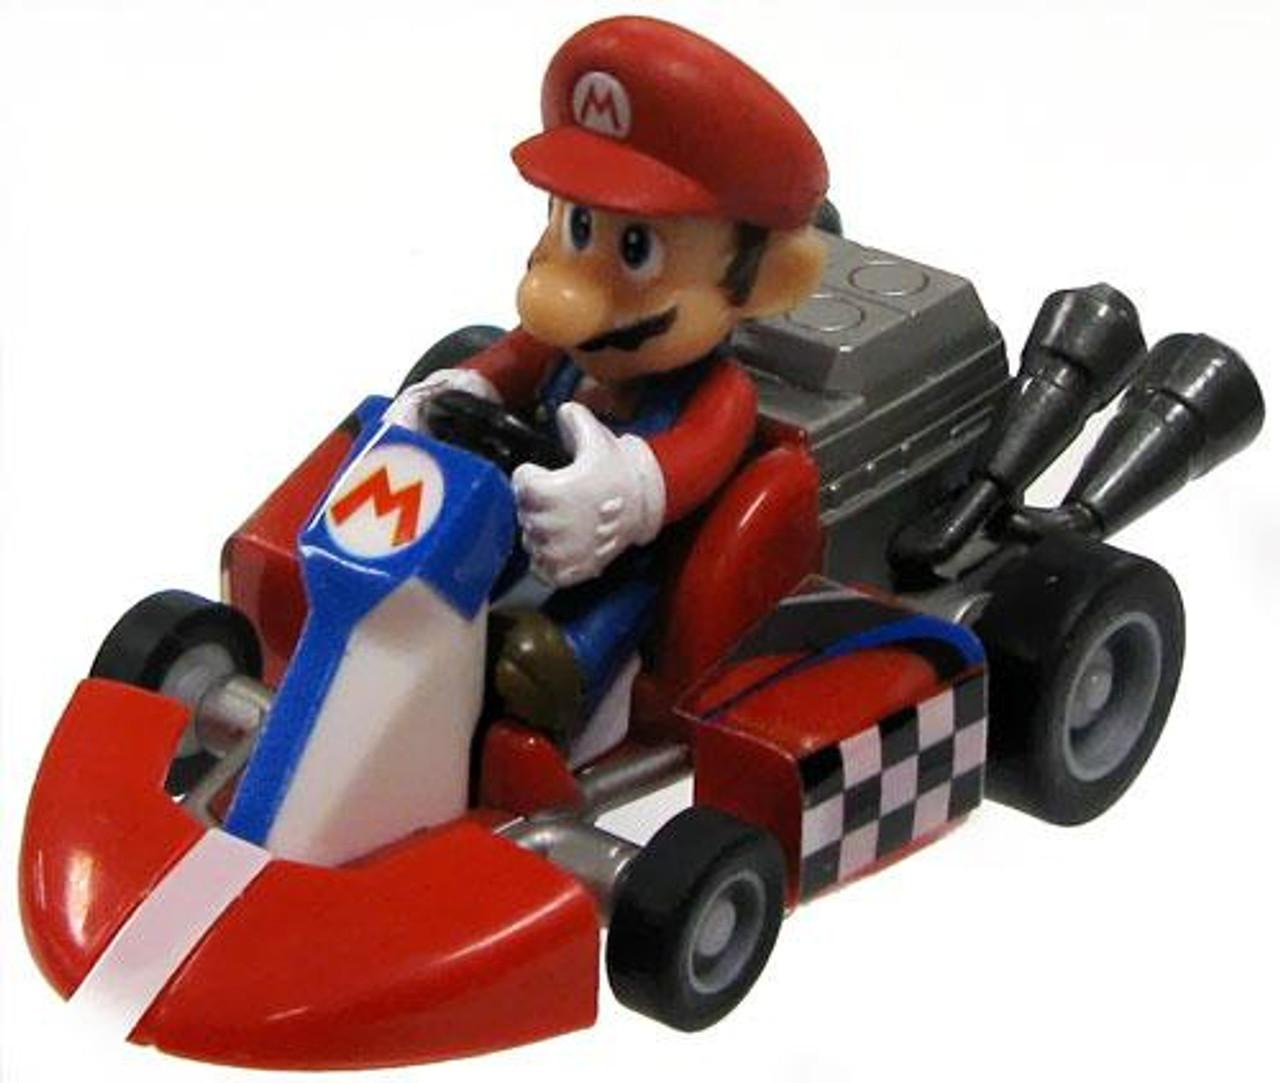 Super Mario Mario Kart Gacha Mario 1.5-Inch Pull Back Racer [Rounded Front Bumper]